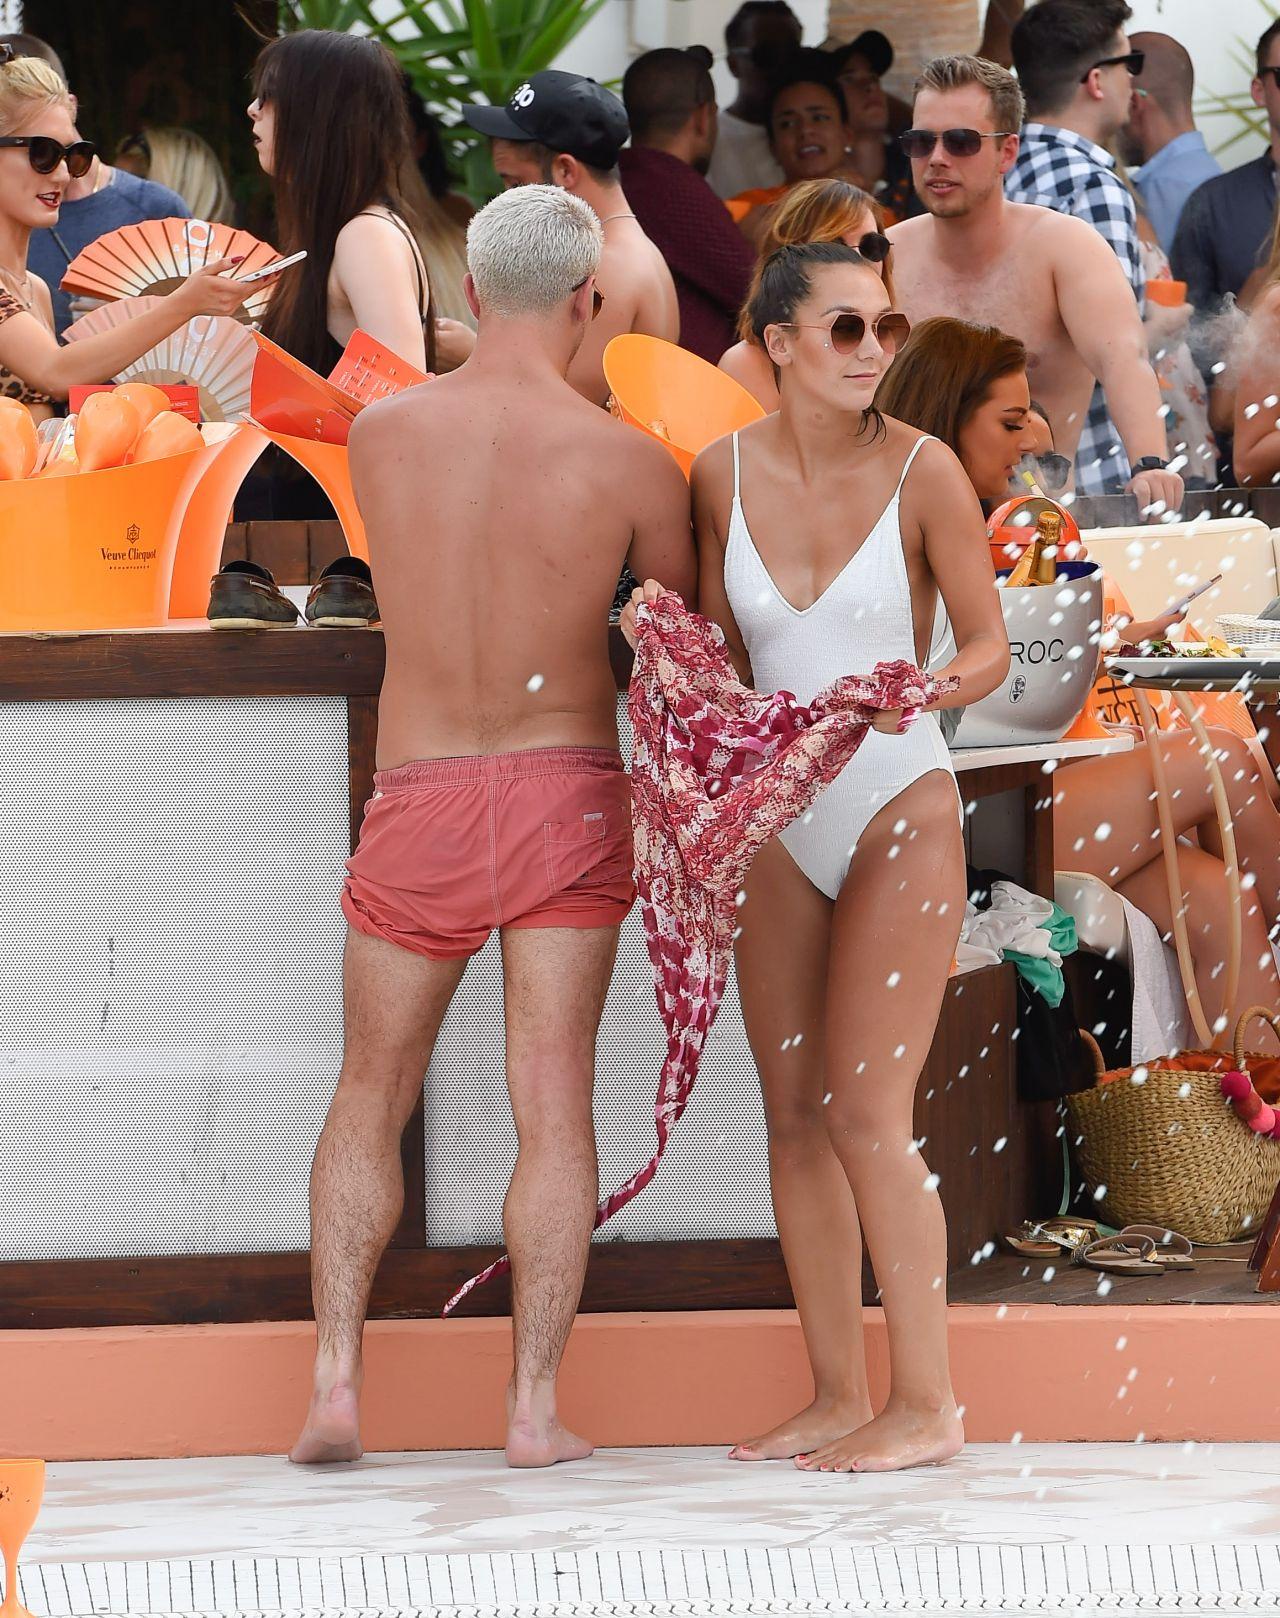 Celebrity Nadine Mulkerrin nudes (58 photos), Tits, Bikini, Boobs, cameltoe 2019